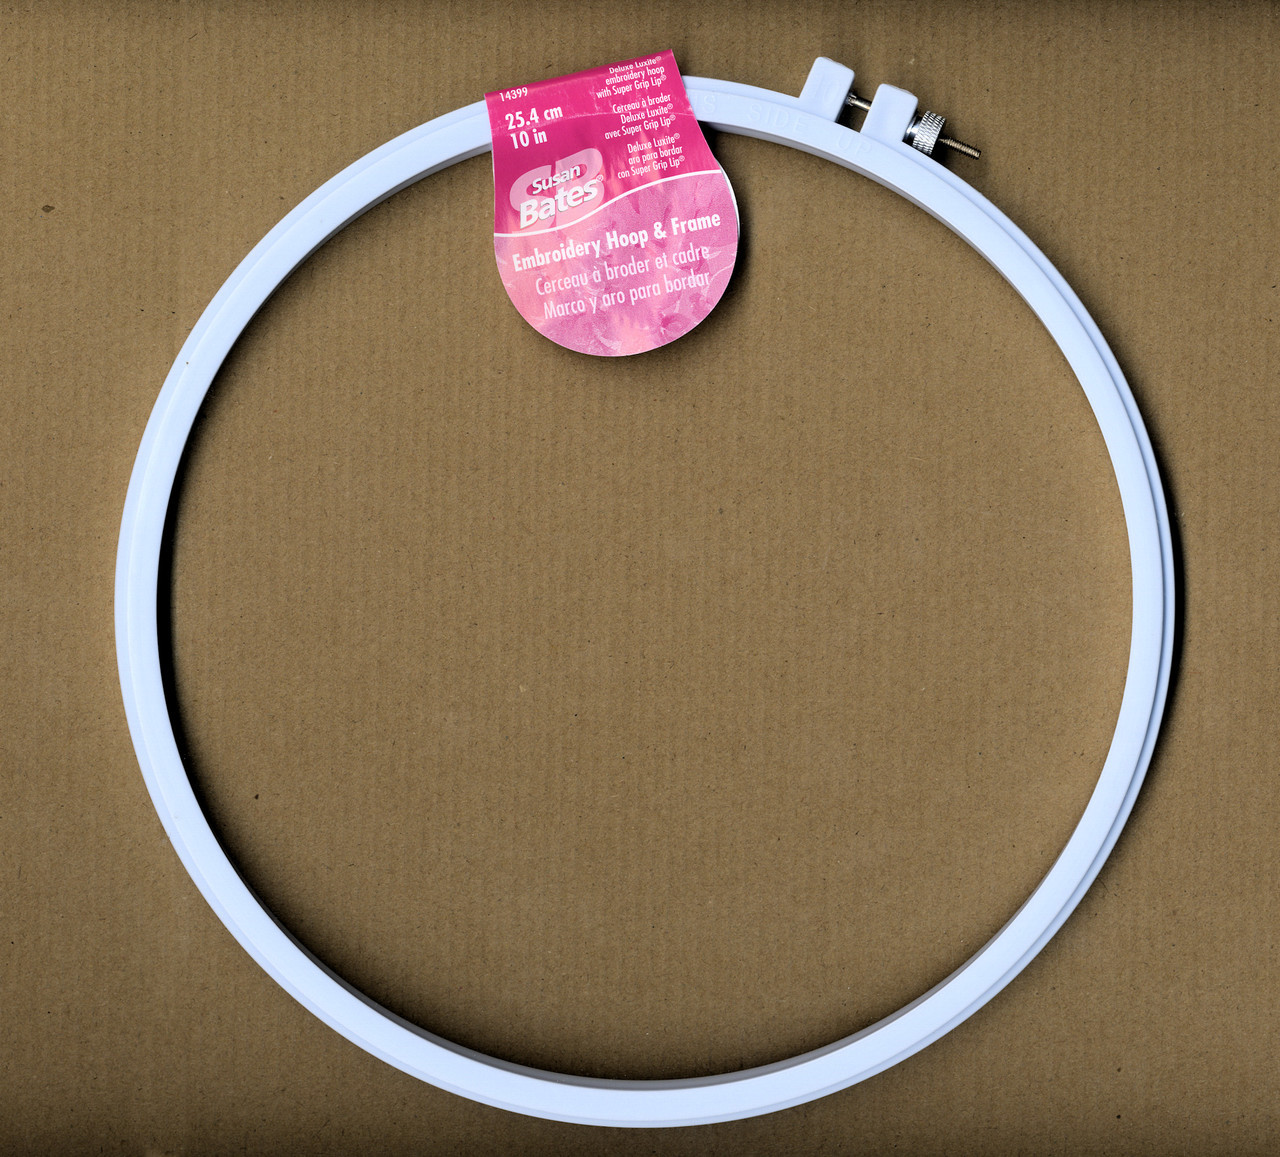 6-Inch Susan Bates Plastic Deluxe Super Grip Embroidery Hoop